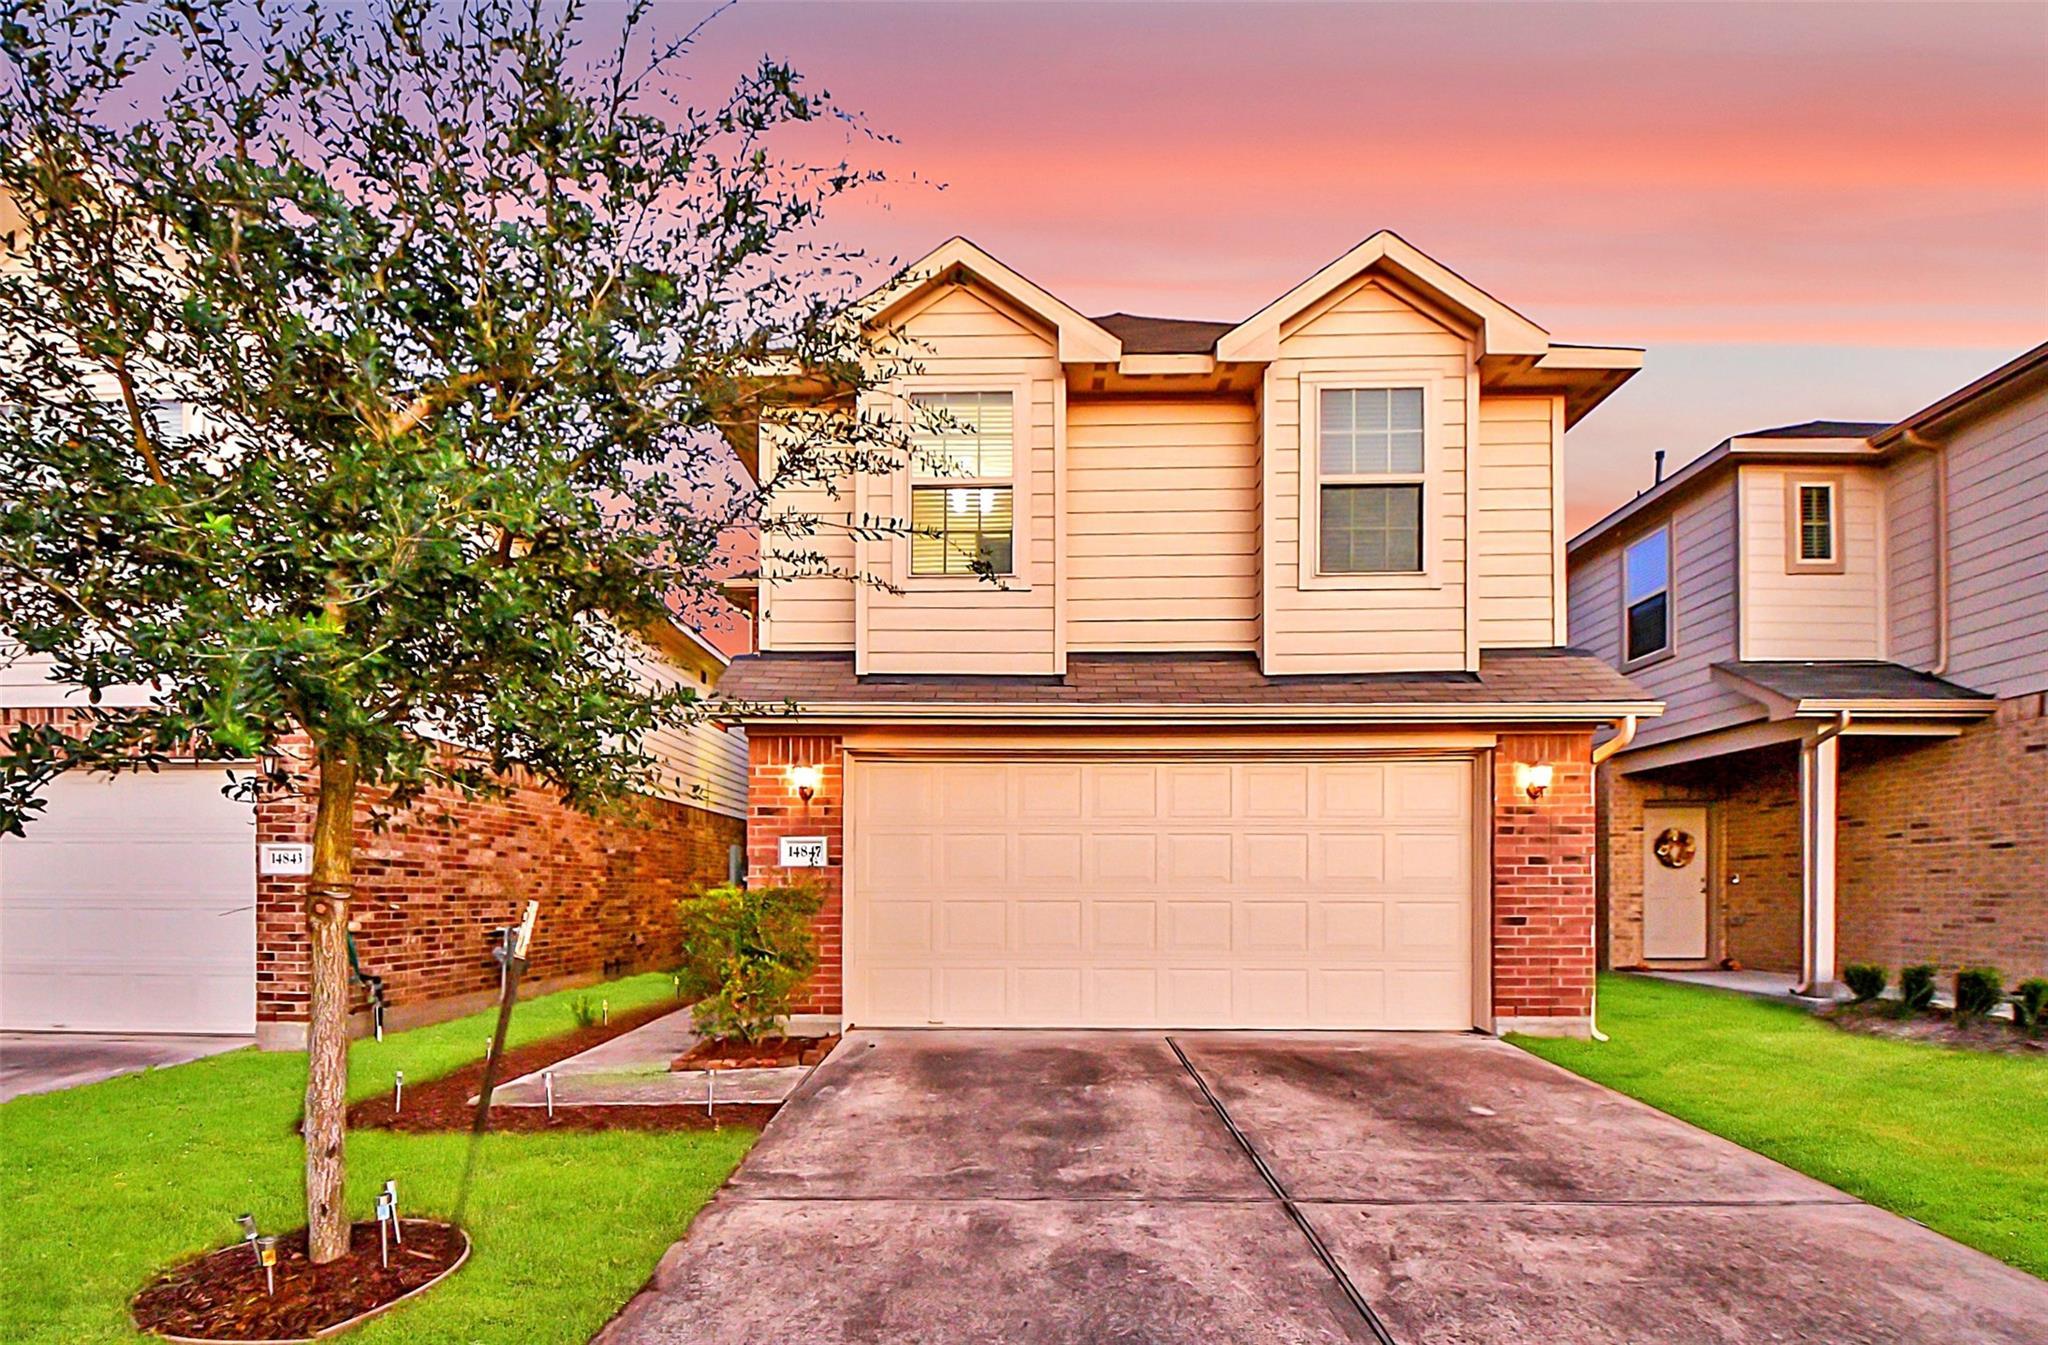 14847 Swansea Harbor Lane Property Photo - Houston, TX real estate listing